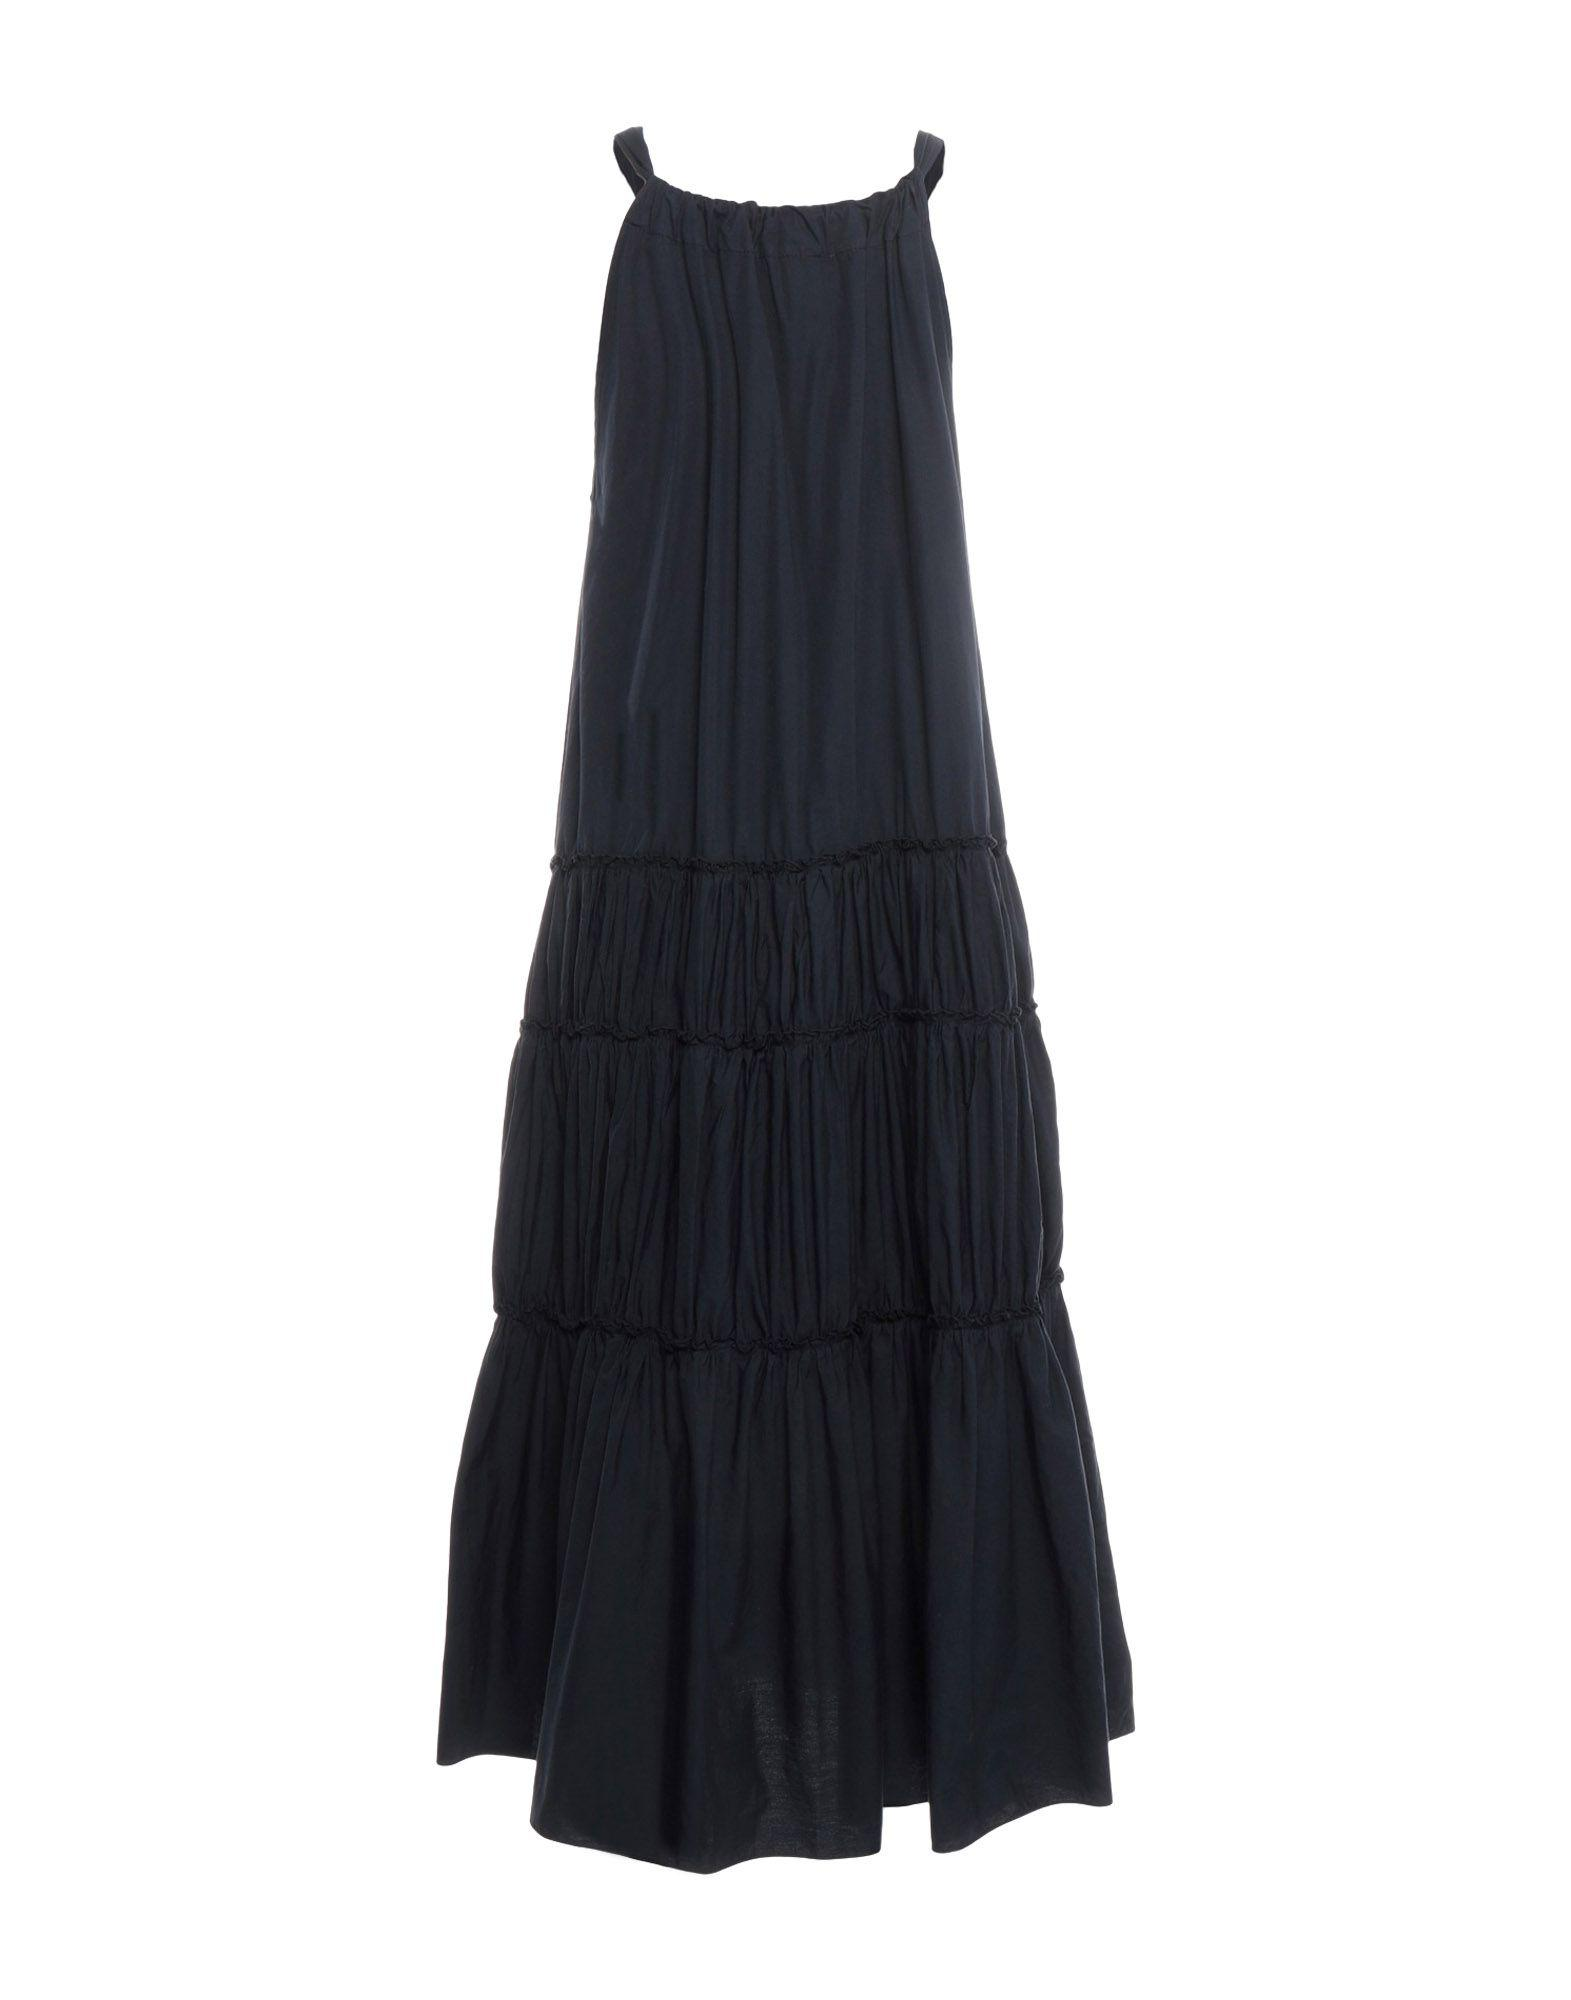 Blue Dress Avn Lyst In 34 Length 7Zv7qPAwx